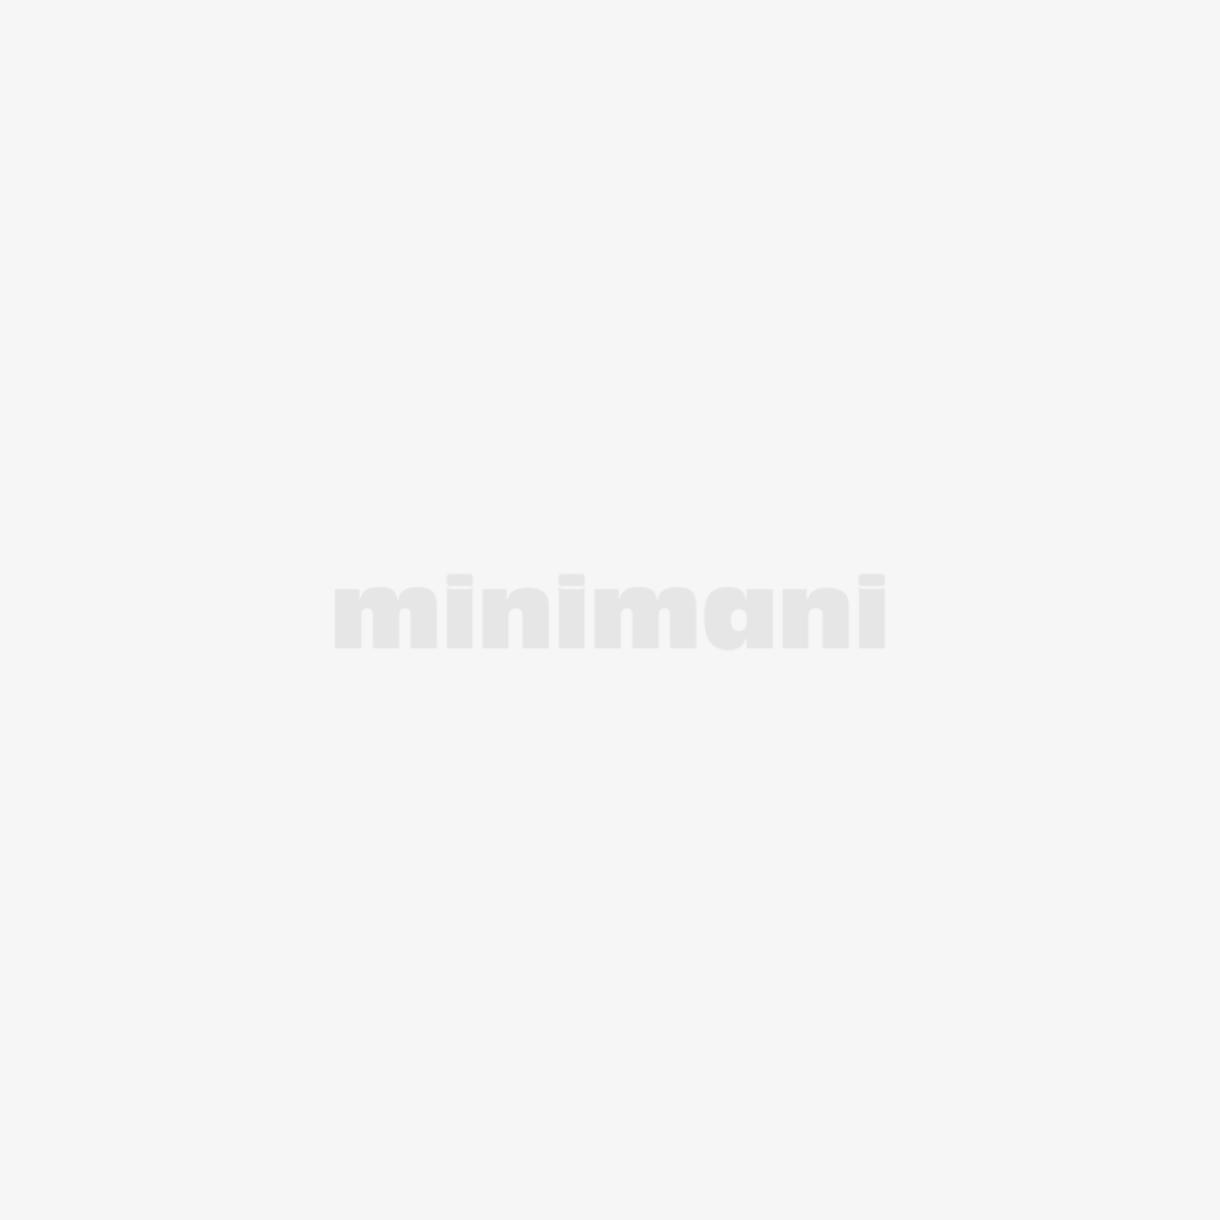 STANLEY KIILLELIIMAPUIKKO LT 1-GS250GS HOPEA/KULTA  11.3mmx101m